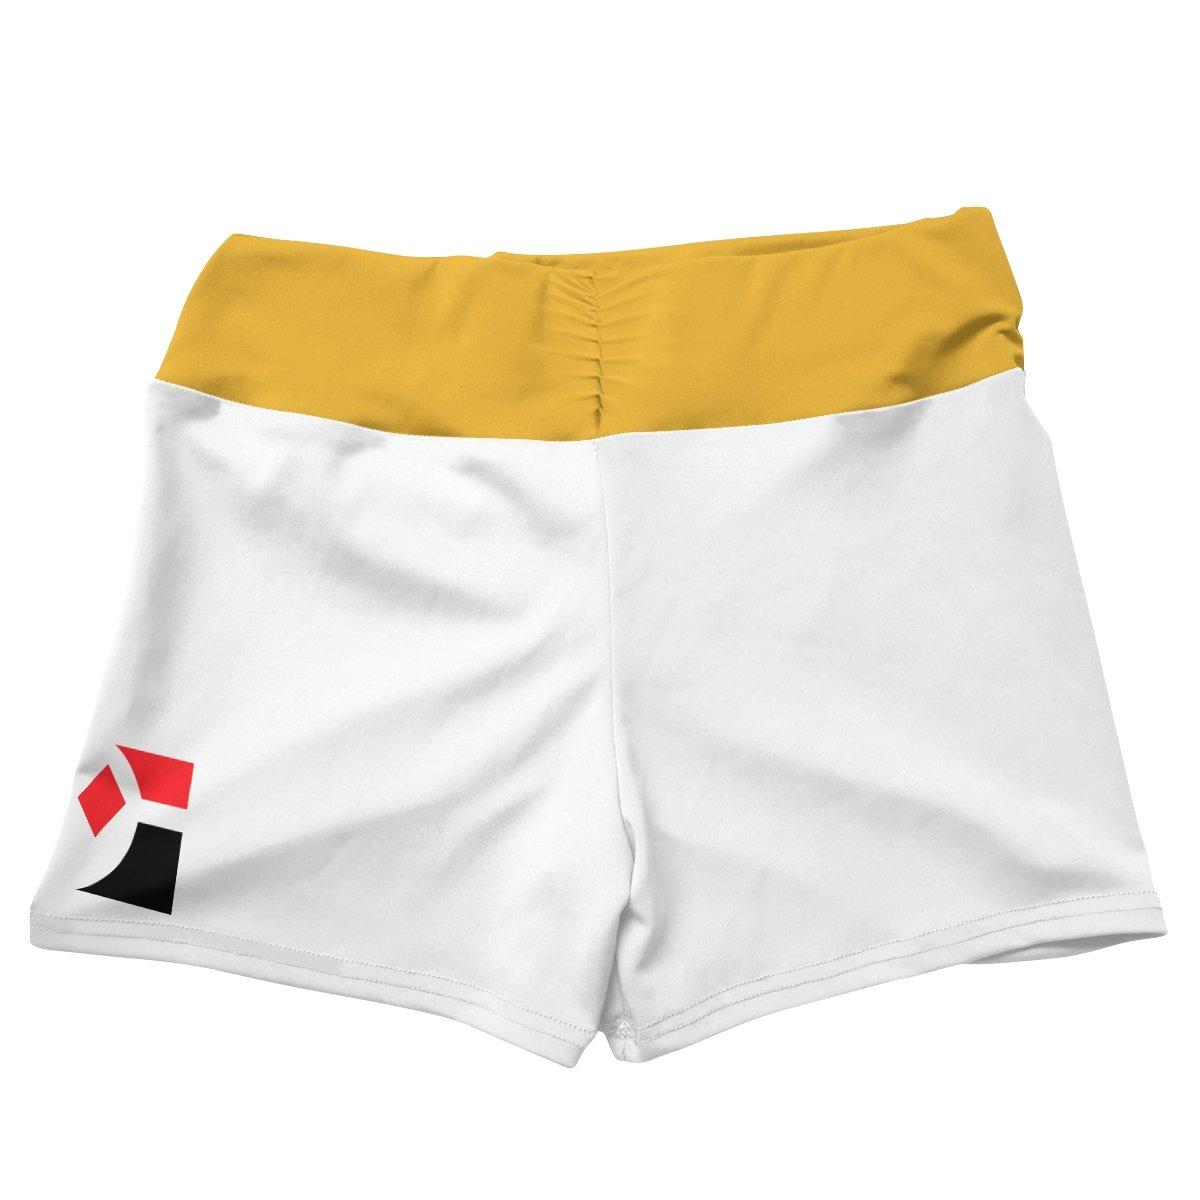 pokemon champion uniform active wear set 452466 - Anime Swimsuits